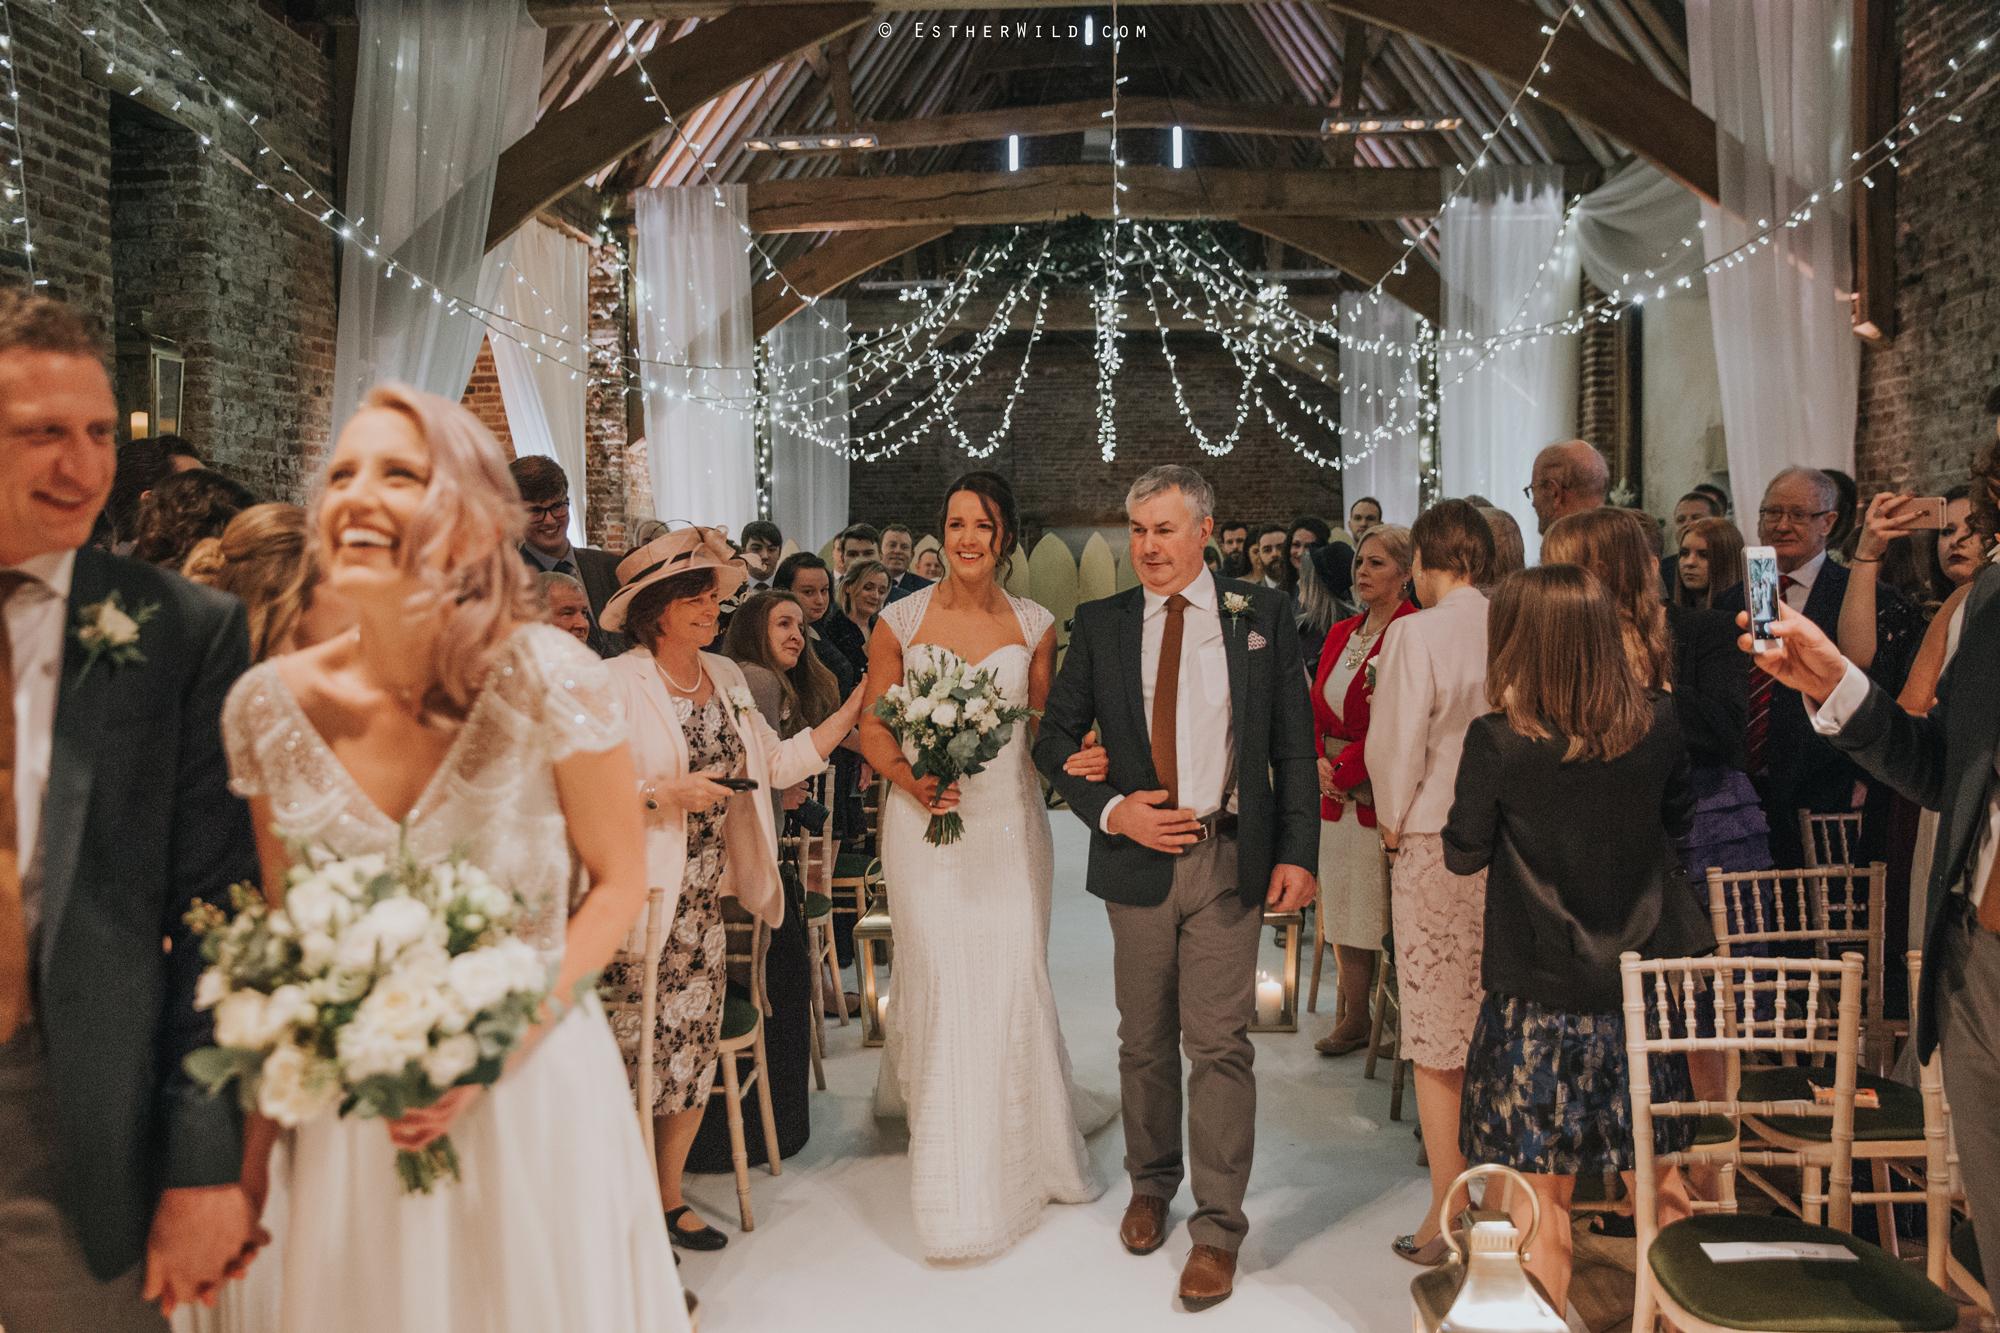 Elms_Barn_Weddings_Suffolk_Photographer_Copyright_Esther_Wild_IMG_1126.jpg